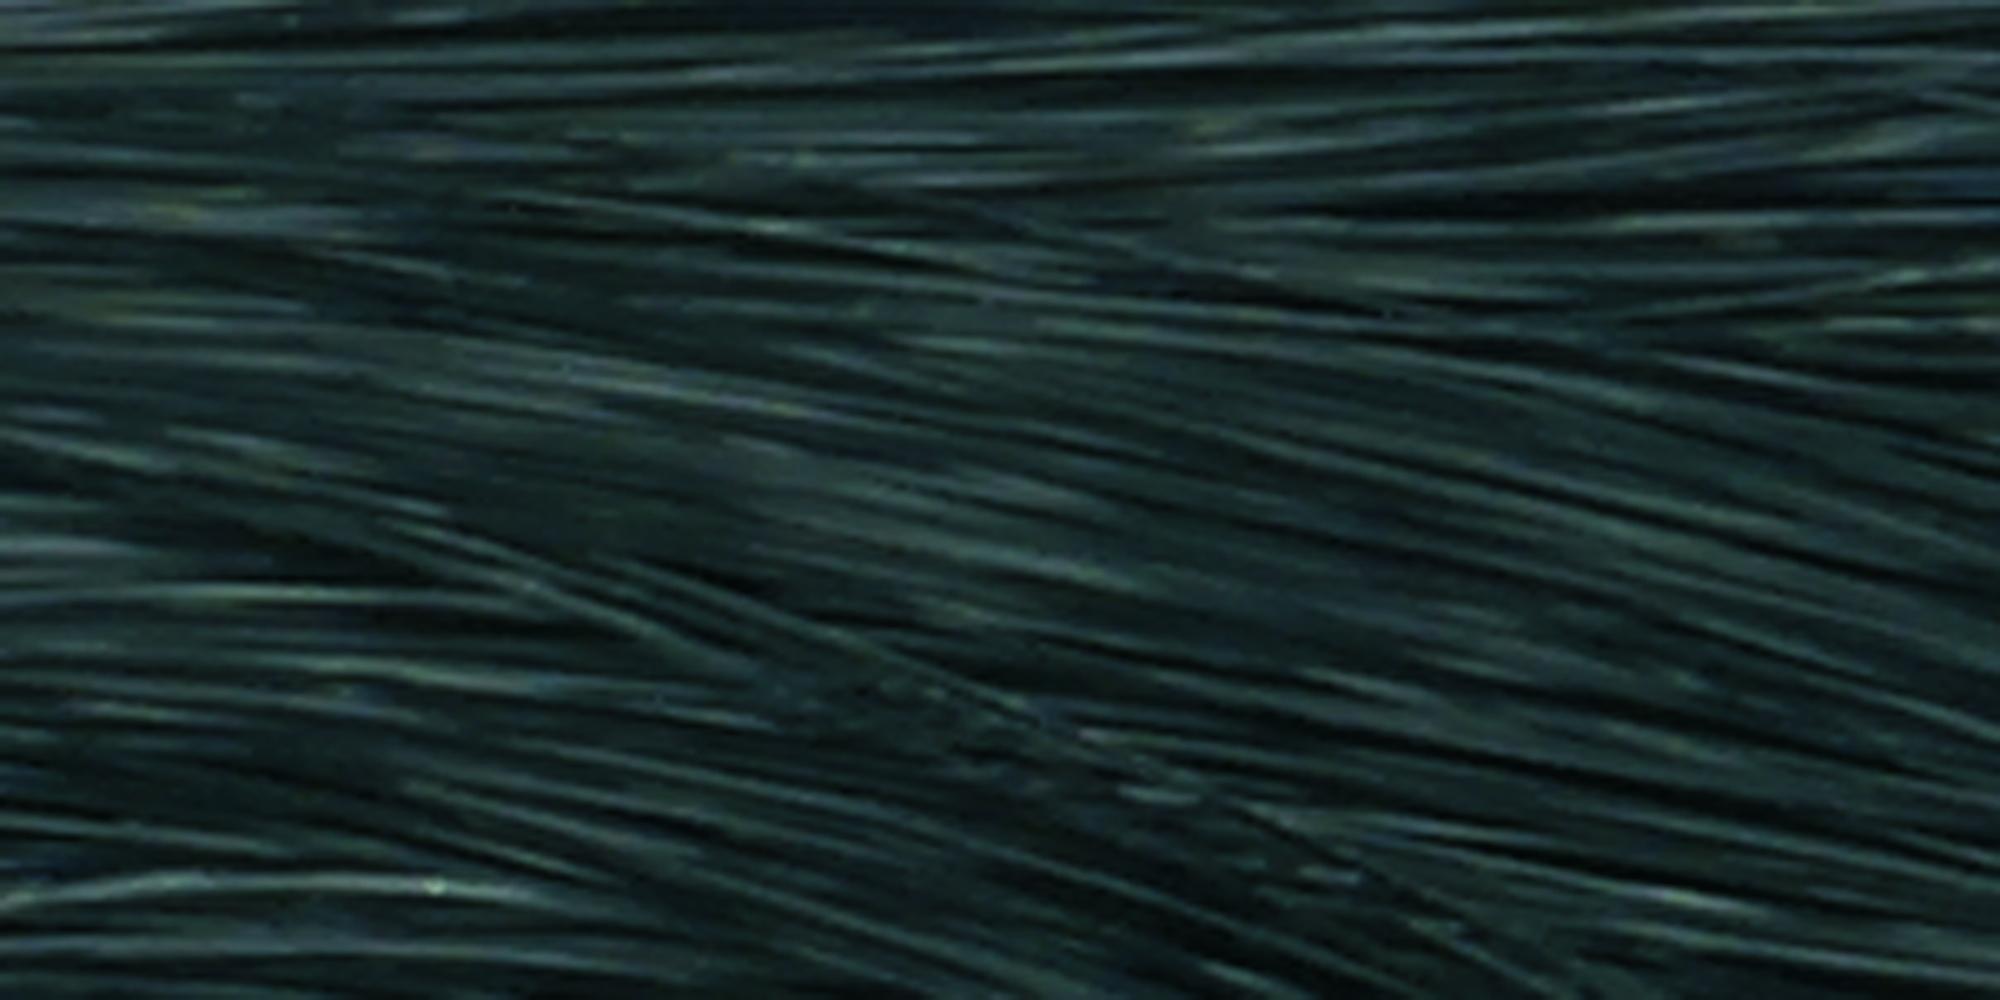 Stargazer-Baby-Hair-Extension-Synthetic-Clip-on-Streak-Various-Colors-43cm thumbnail 6